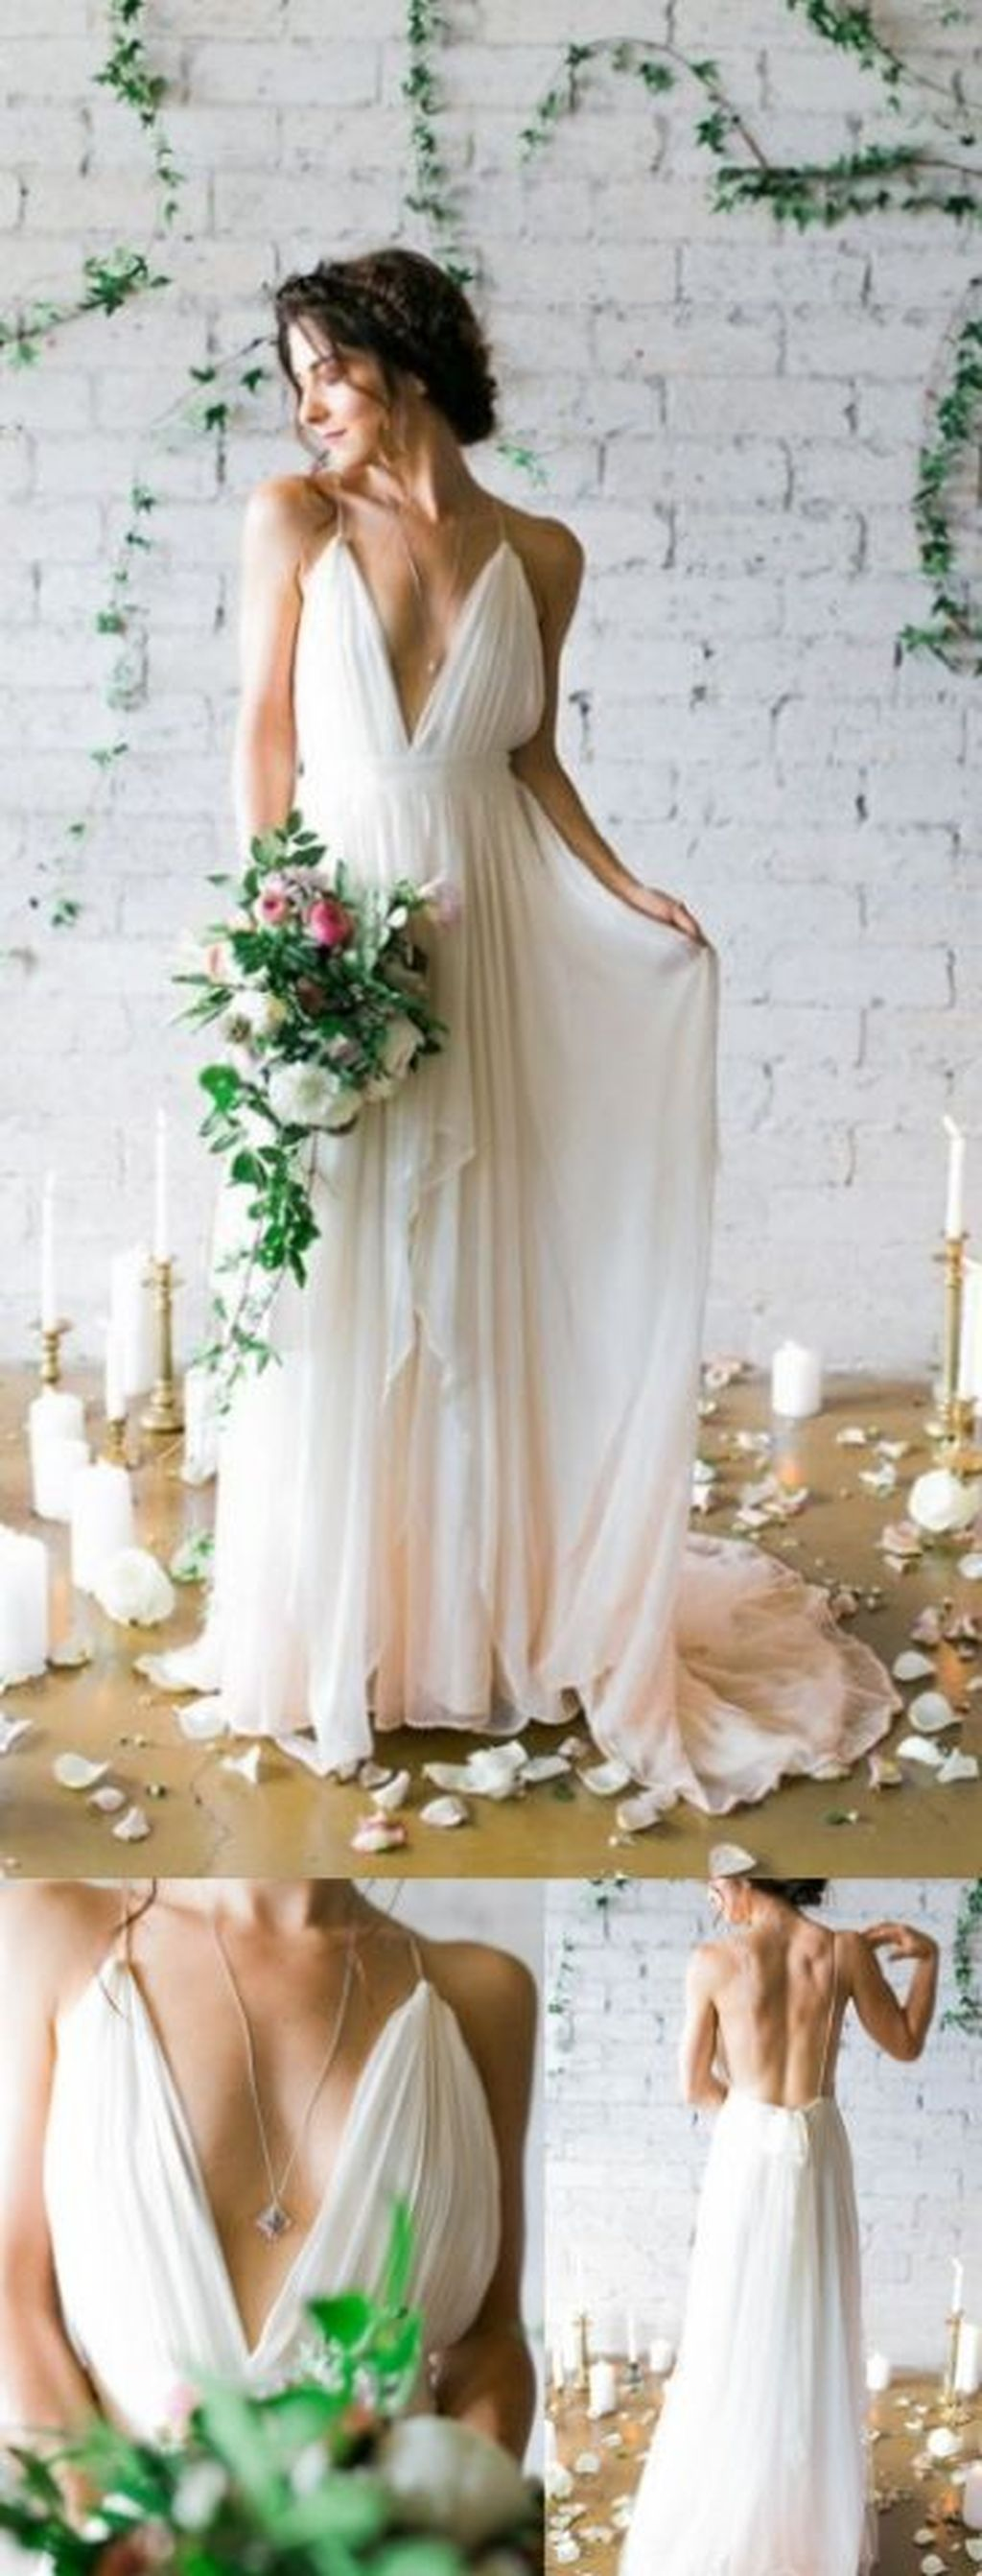 best princess wedding dress ideas for beach theme princess